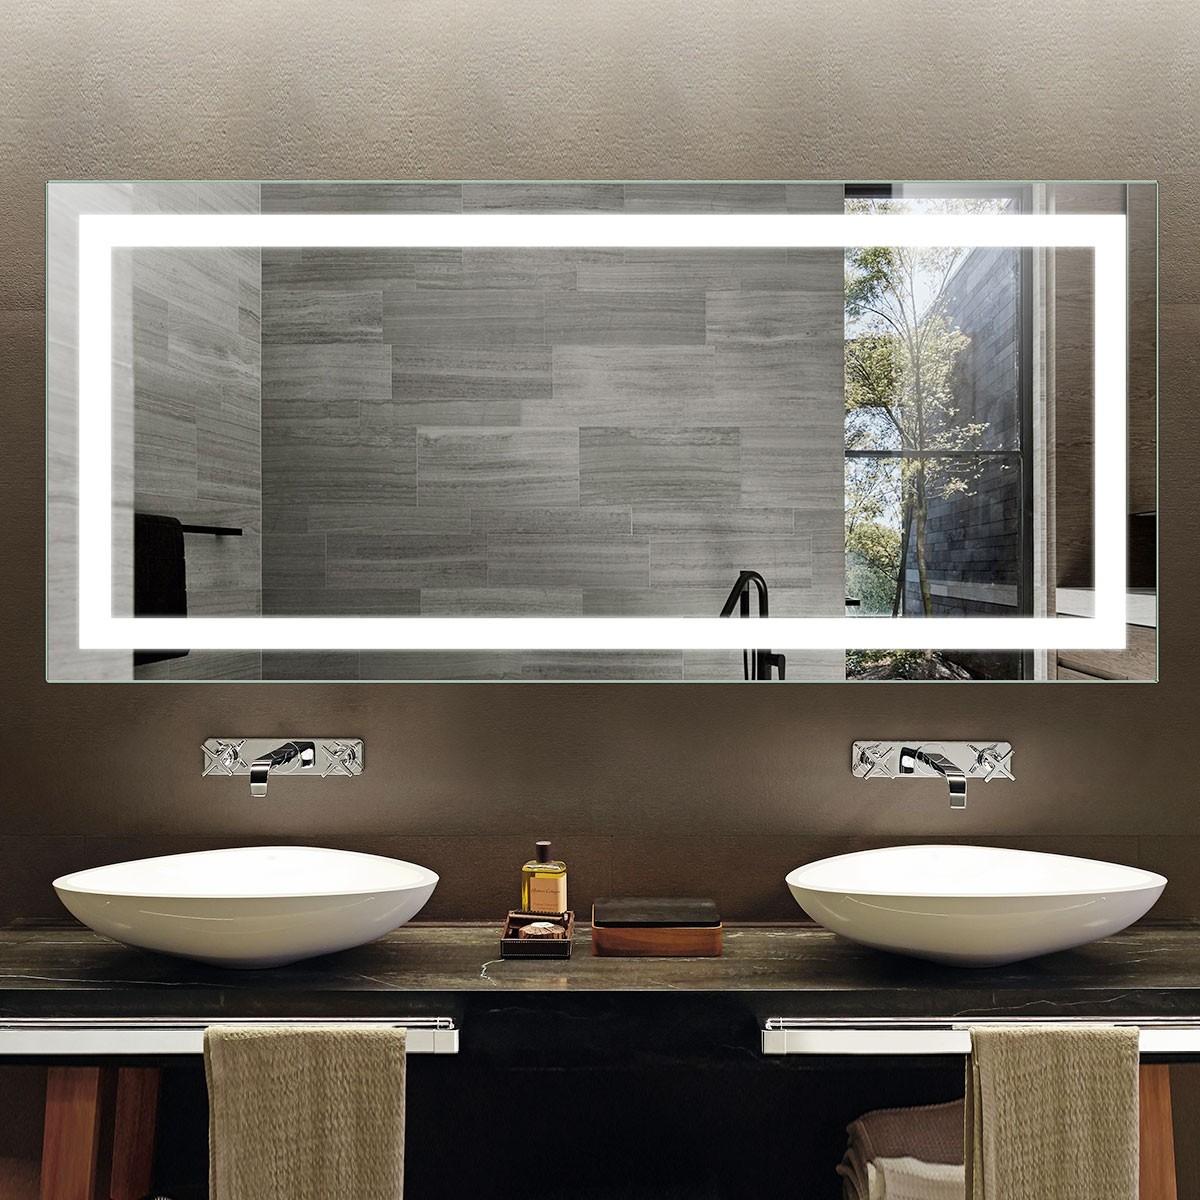 Decoraport 70 x 32 In LED Bathroom Mirror with Infrared Sensor Control, Anti-Fog, Vertical & Horizontal Mount (CK010-7032-GS)